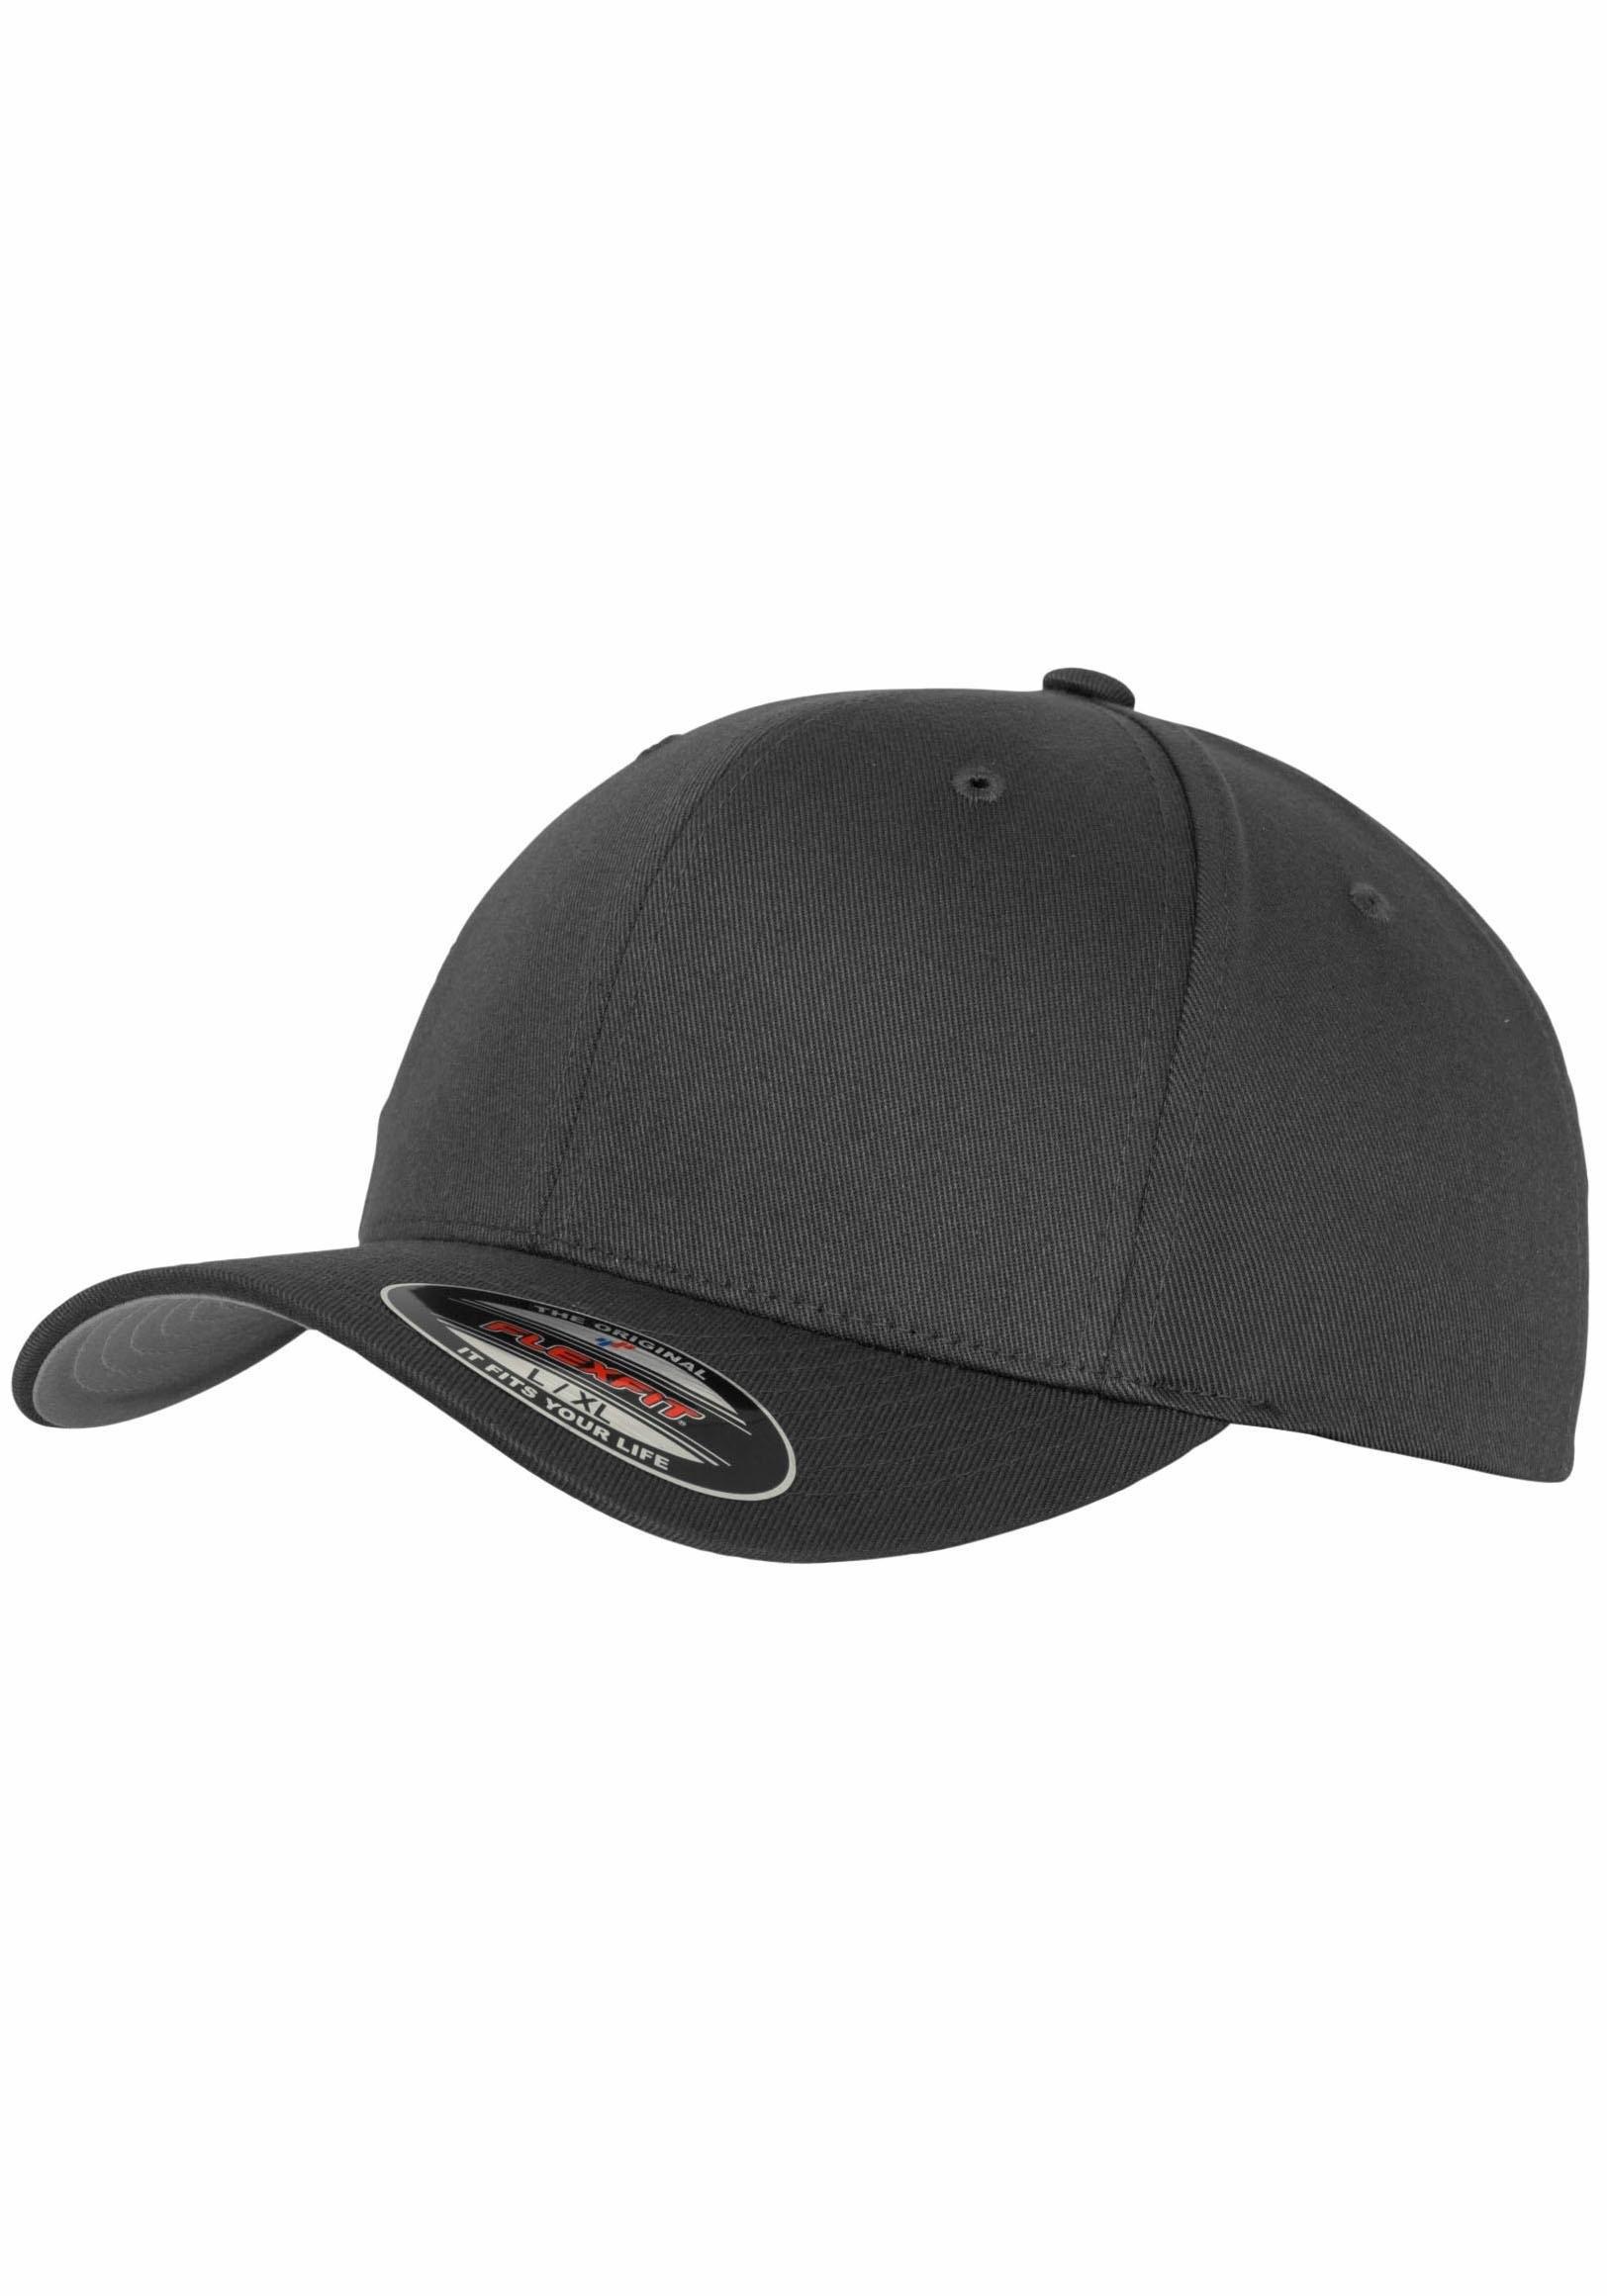 Flexfit baseballcap nu online kopen bij OTTO